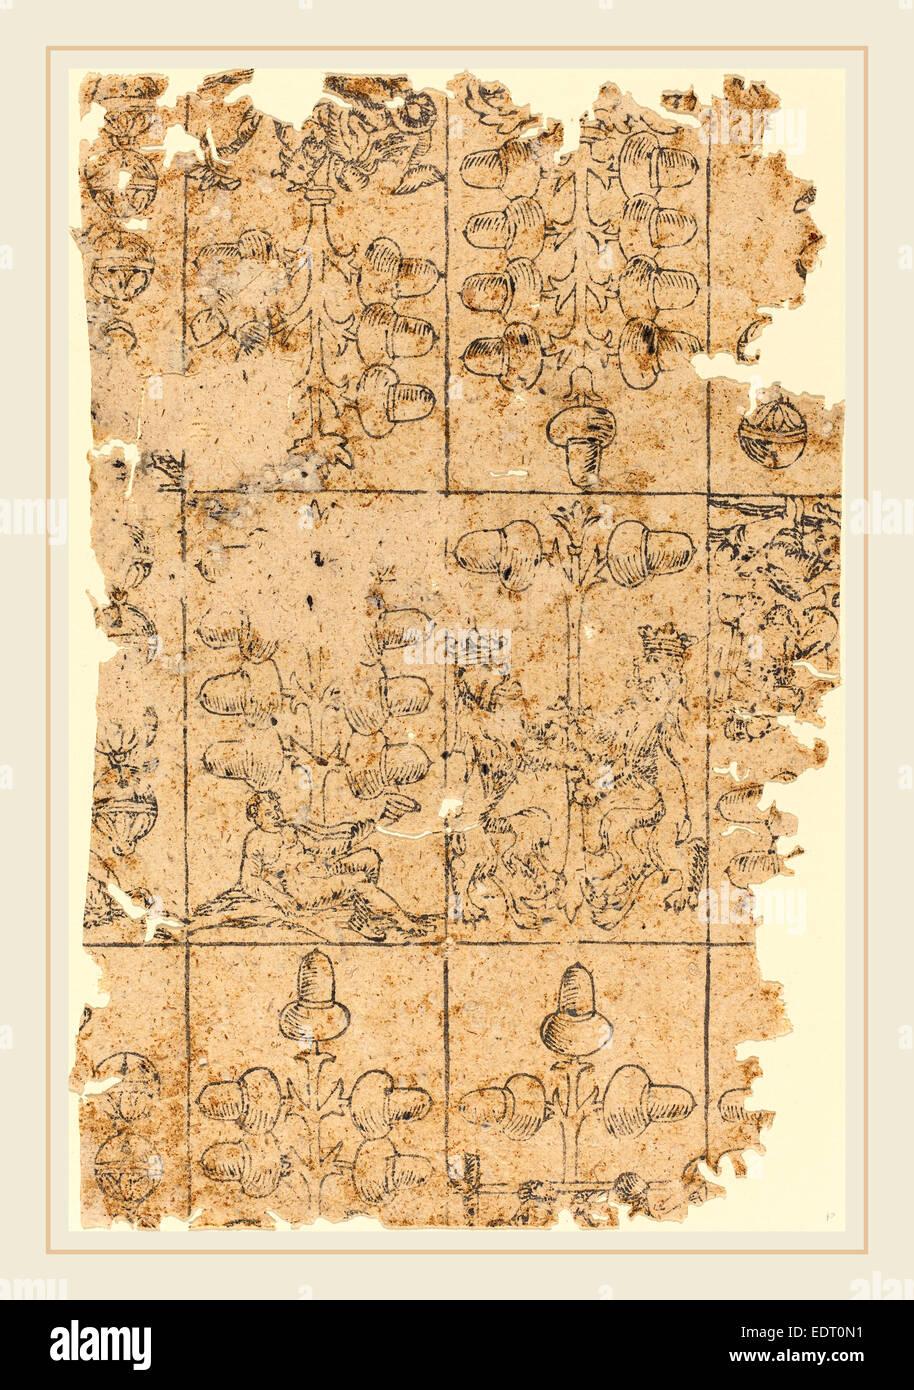 Deutsche 16. Jahrhundert, Spielkarte, Holzschnitt Stockbild